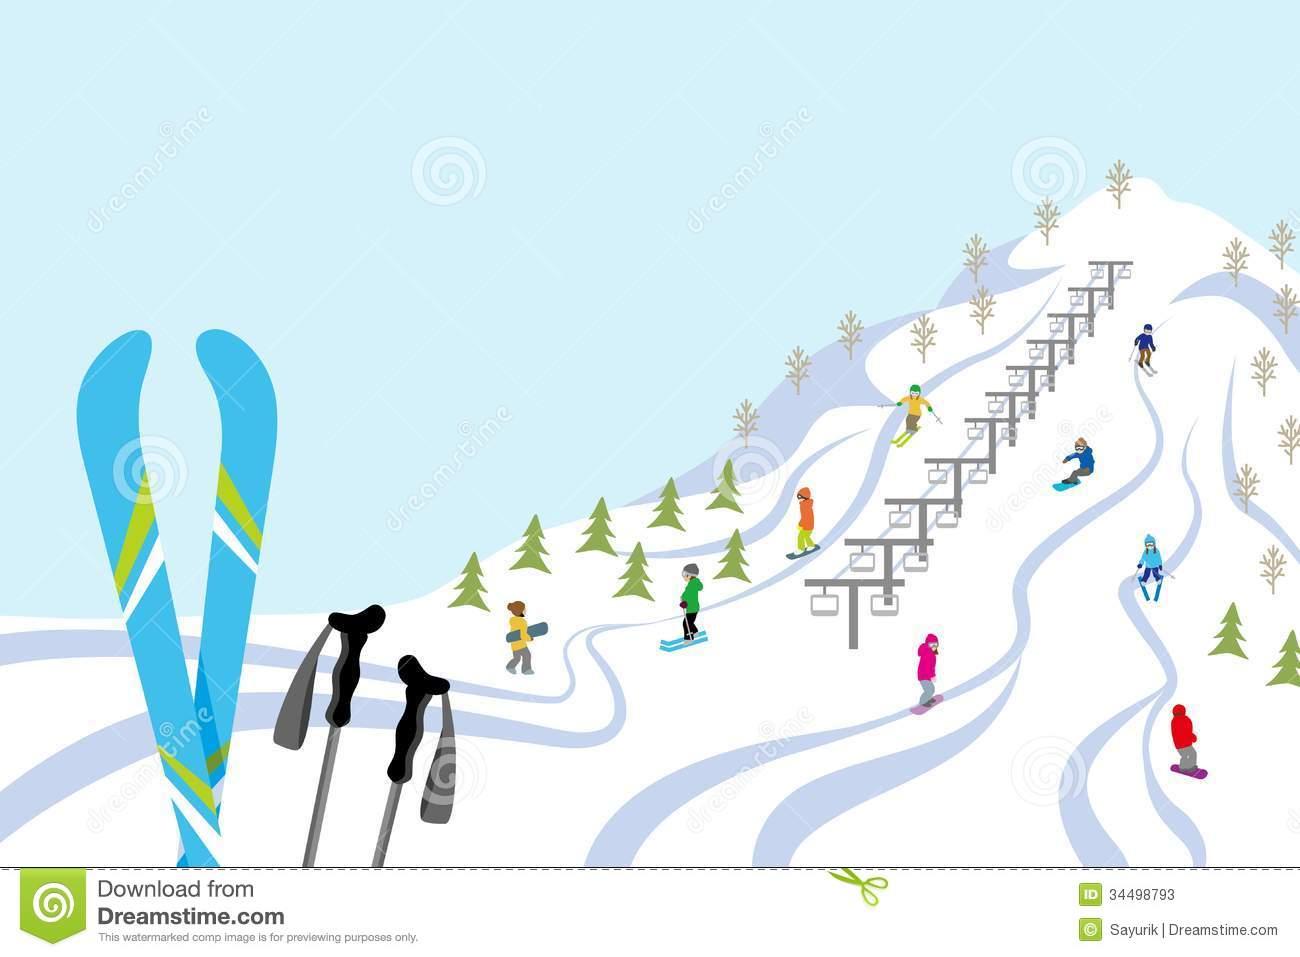 Ski slope clipart free.